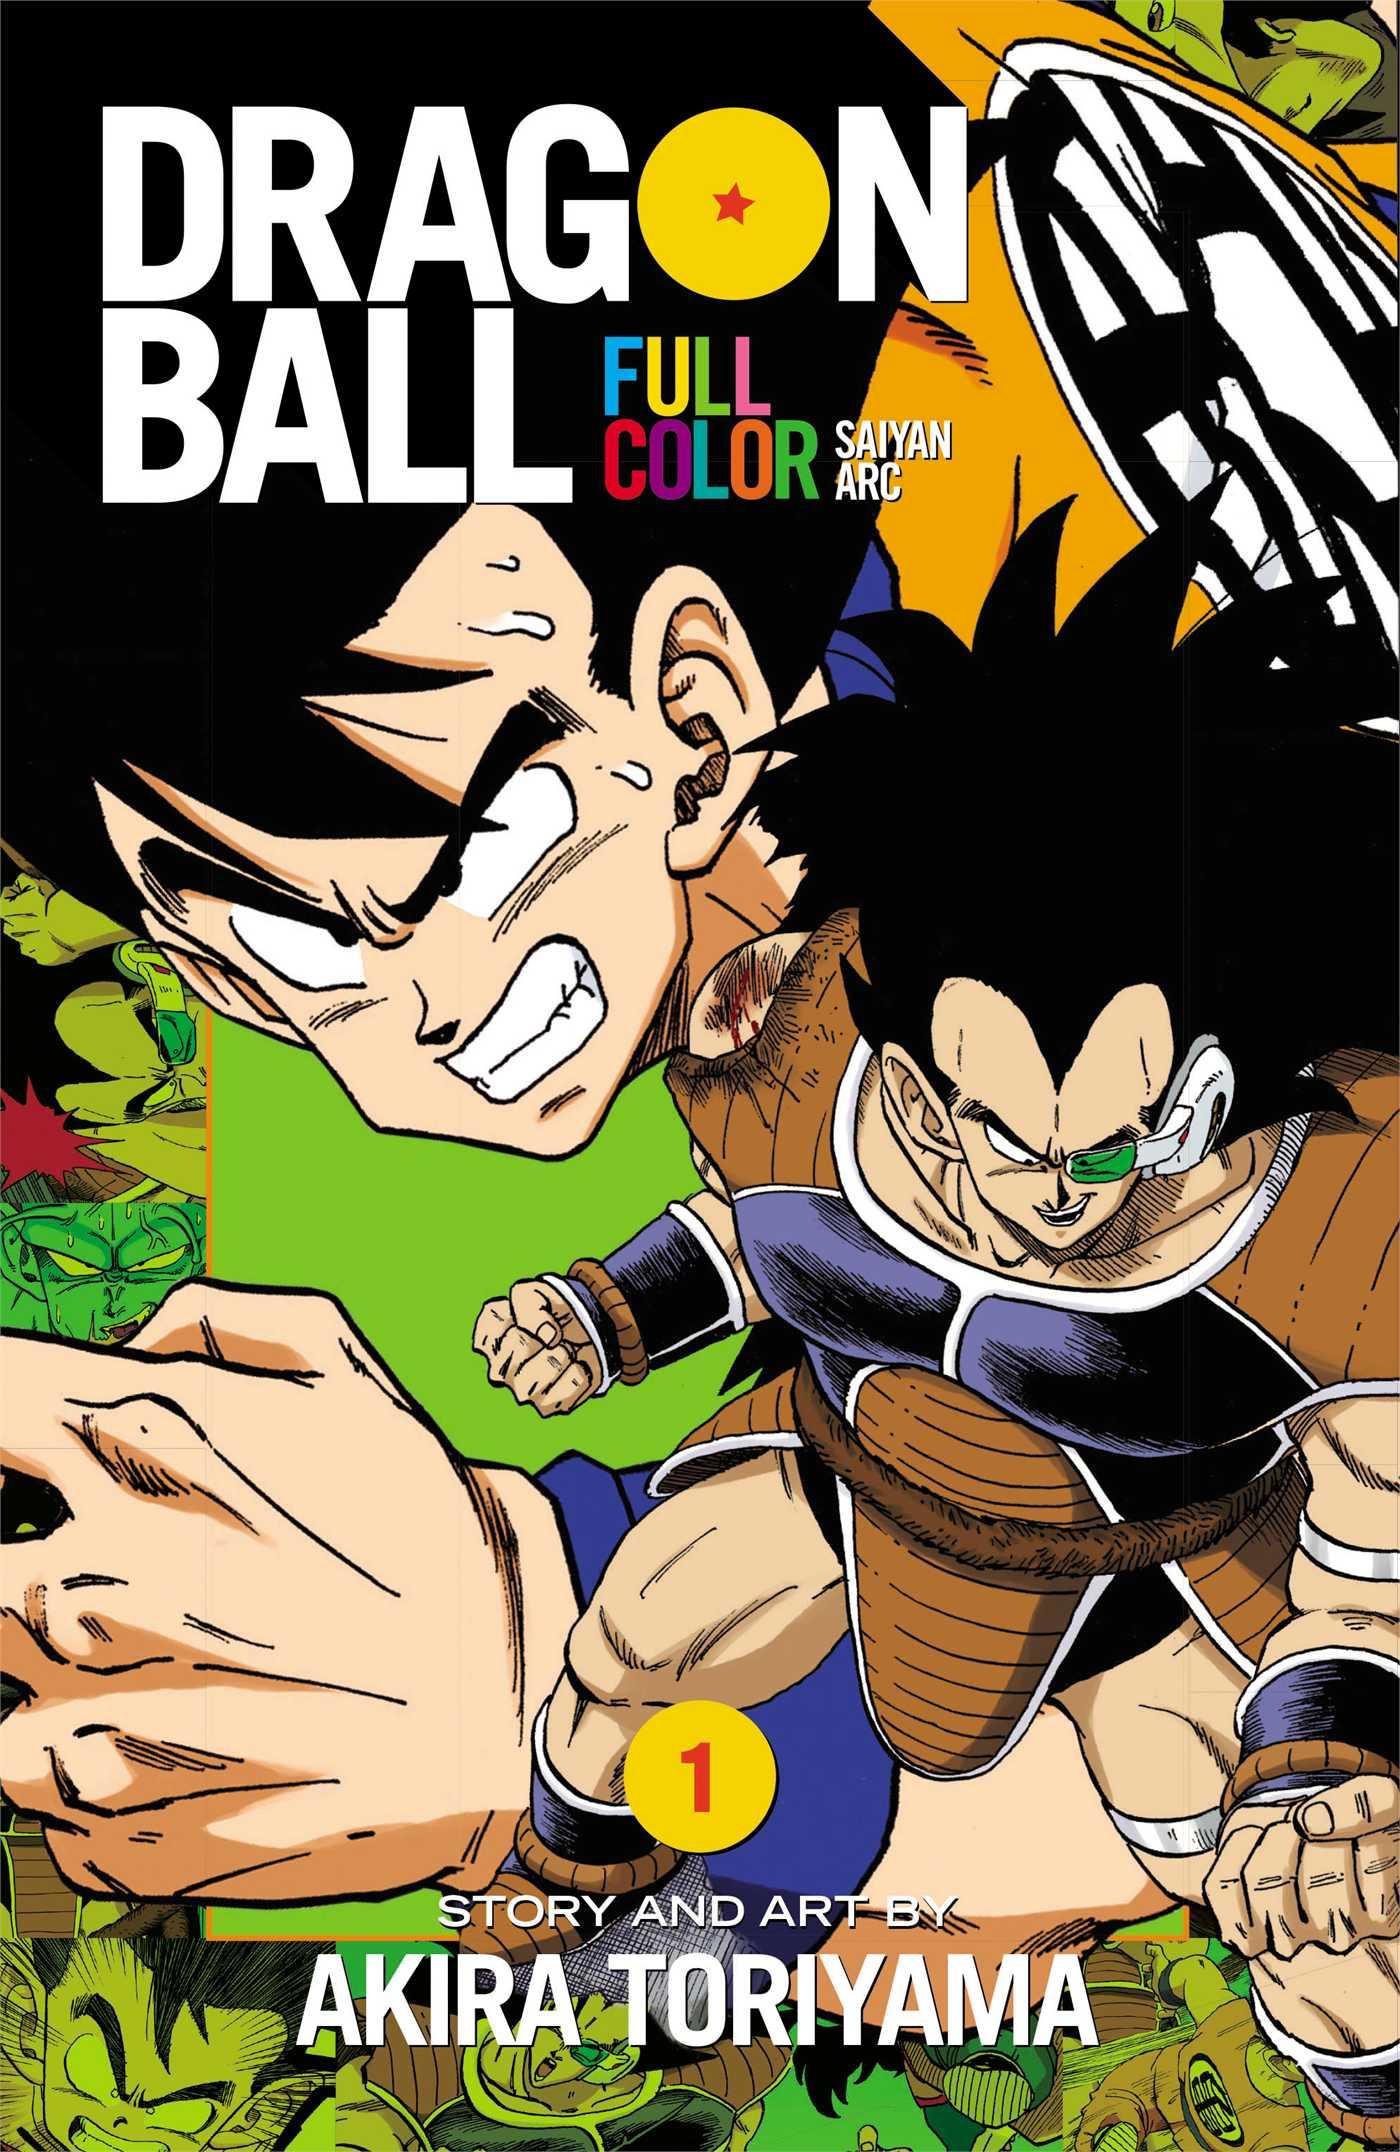 Dragon Ball Full Color Manga Vol. 1 @Archonia_US